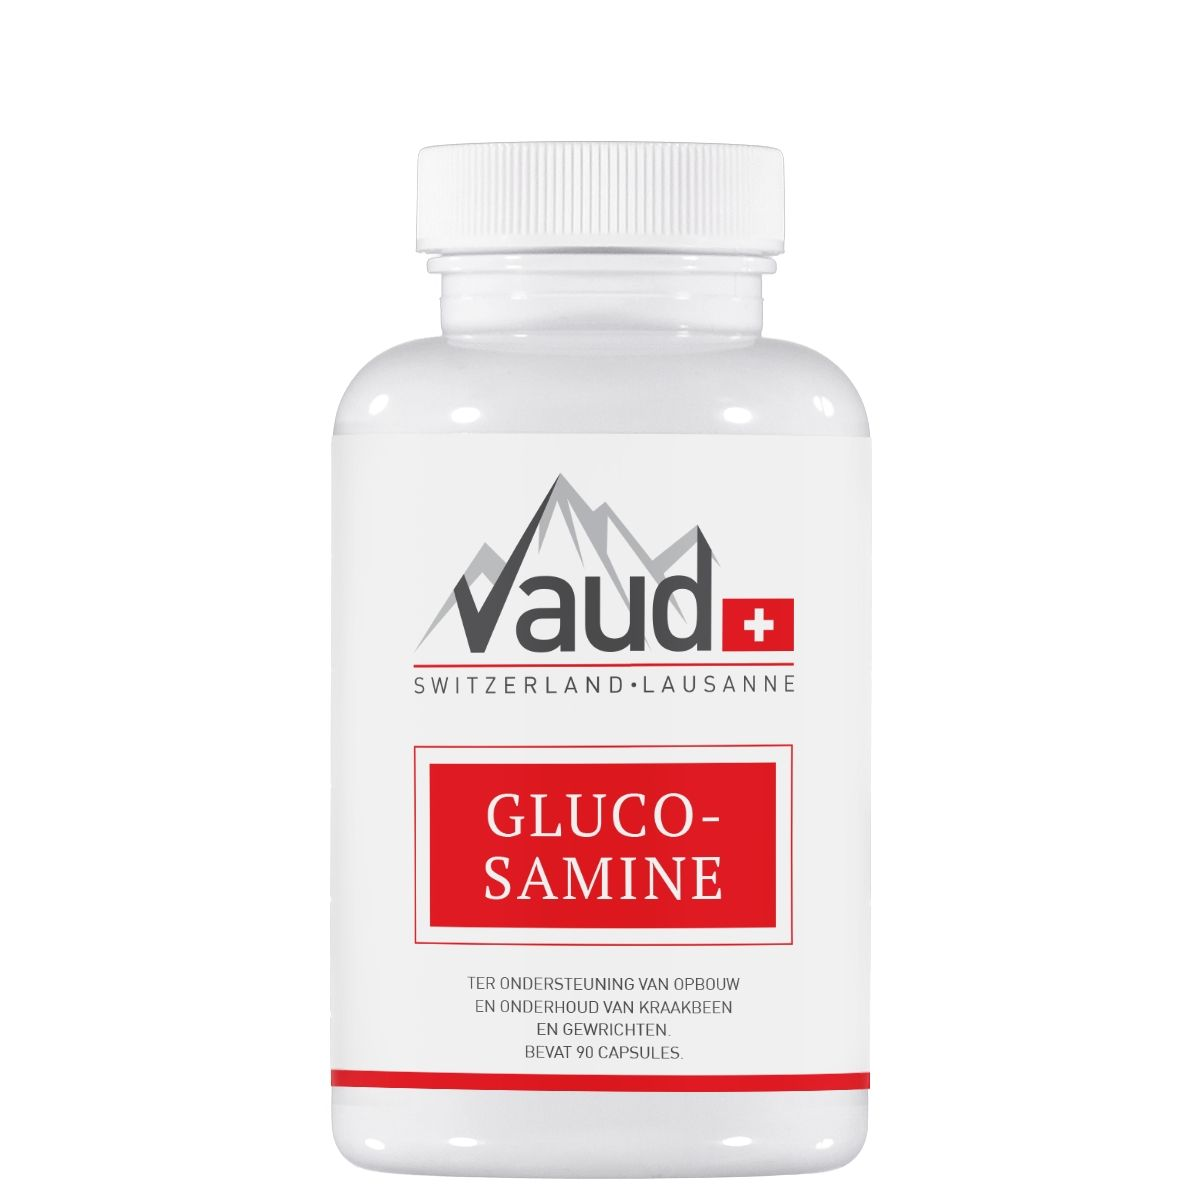 glucosamine gewrichten kraakbeen